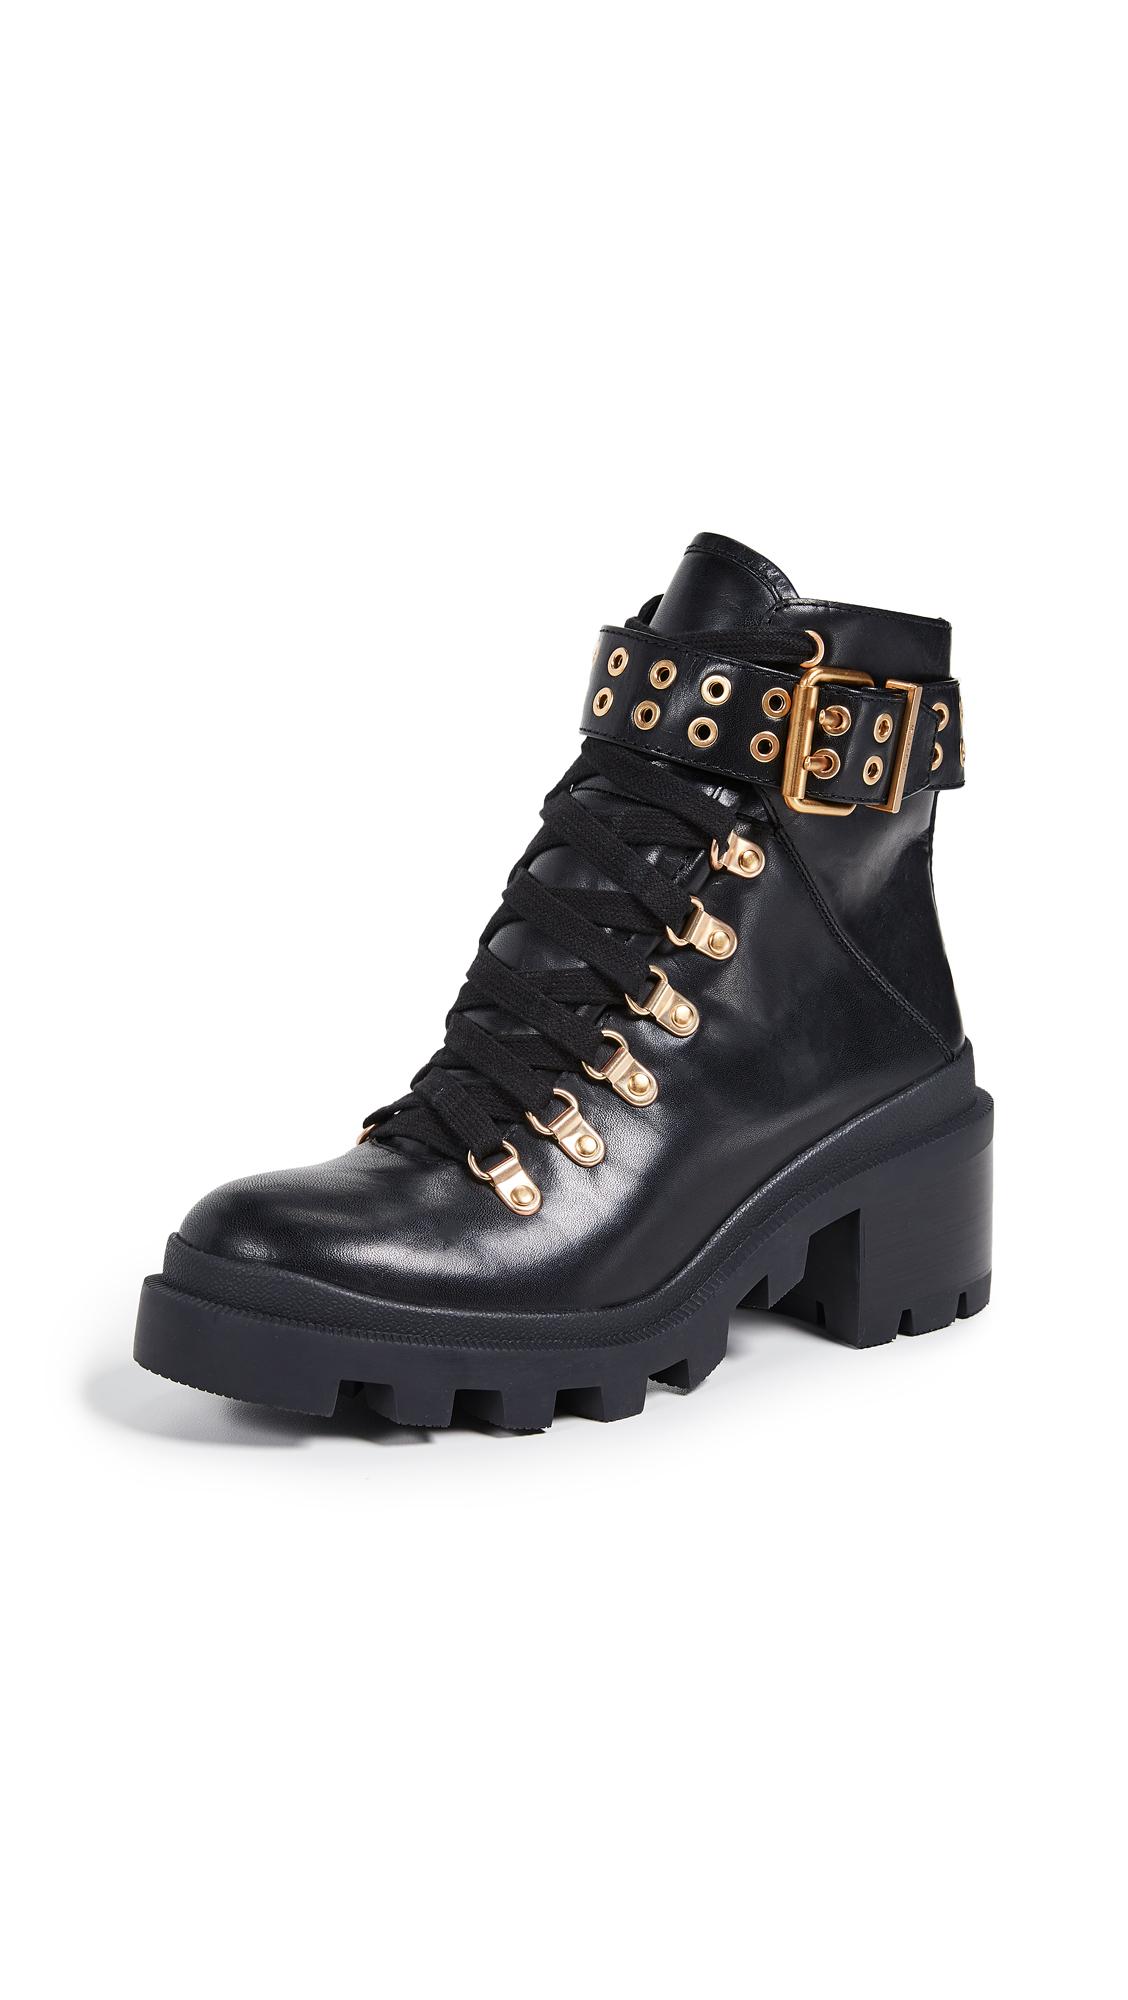 alice + olivia Havis Moto Boots - Black